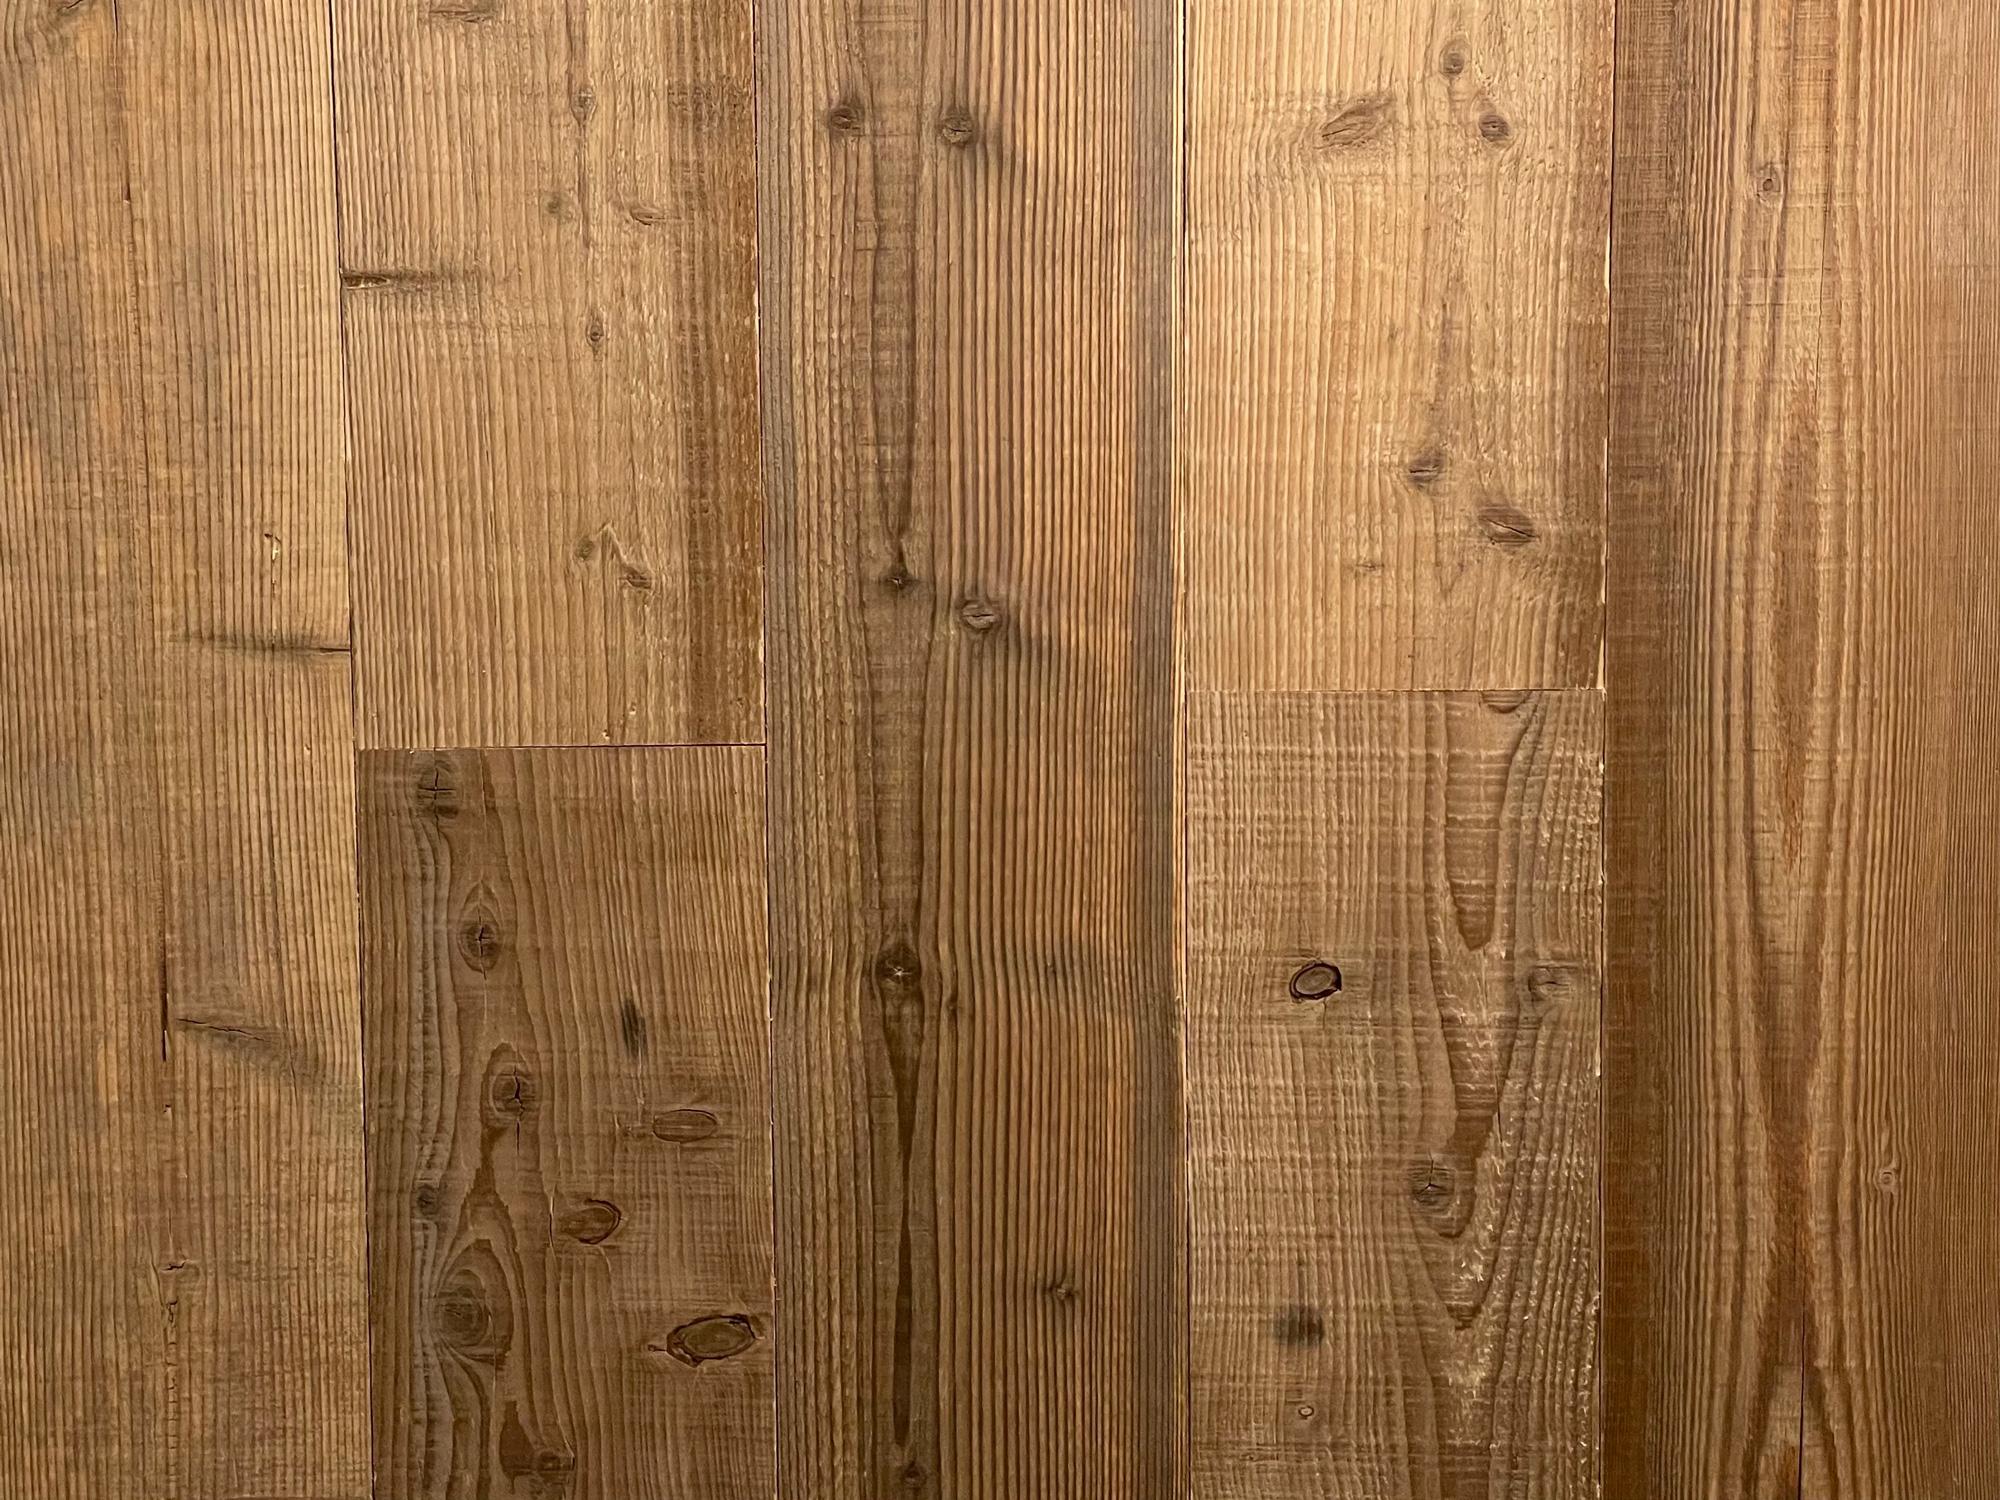 Brown Barn Board Reclaimed Cladding